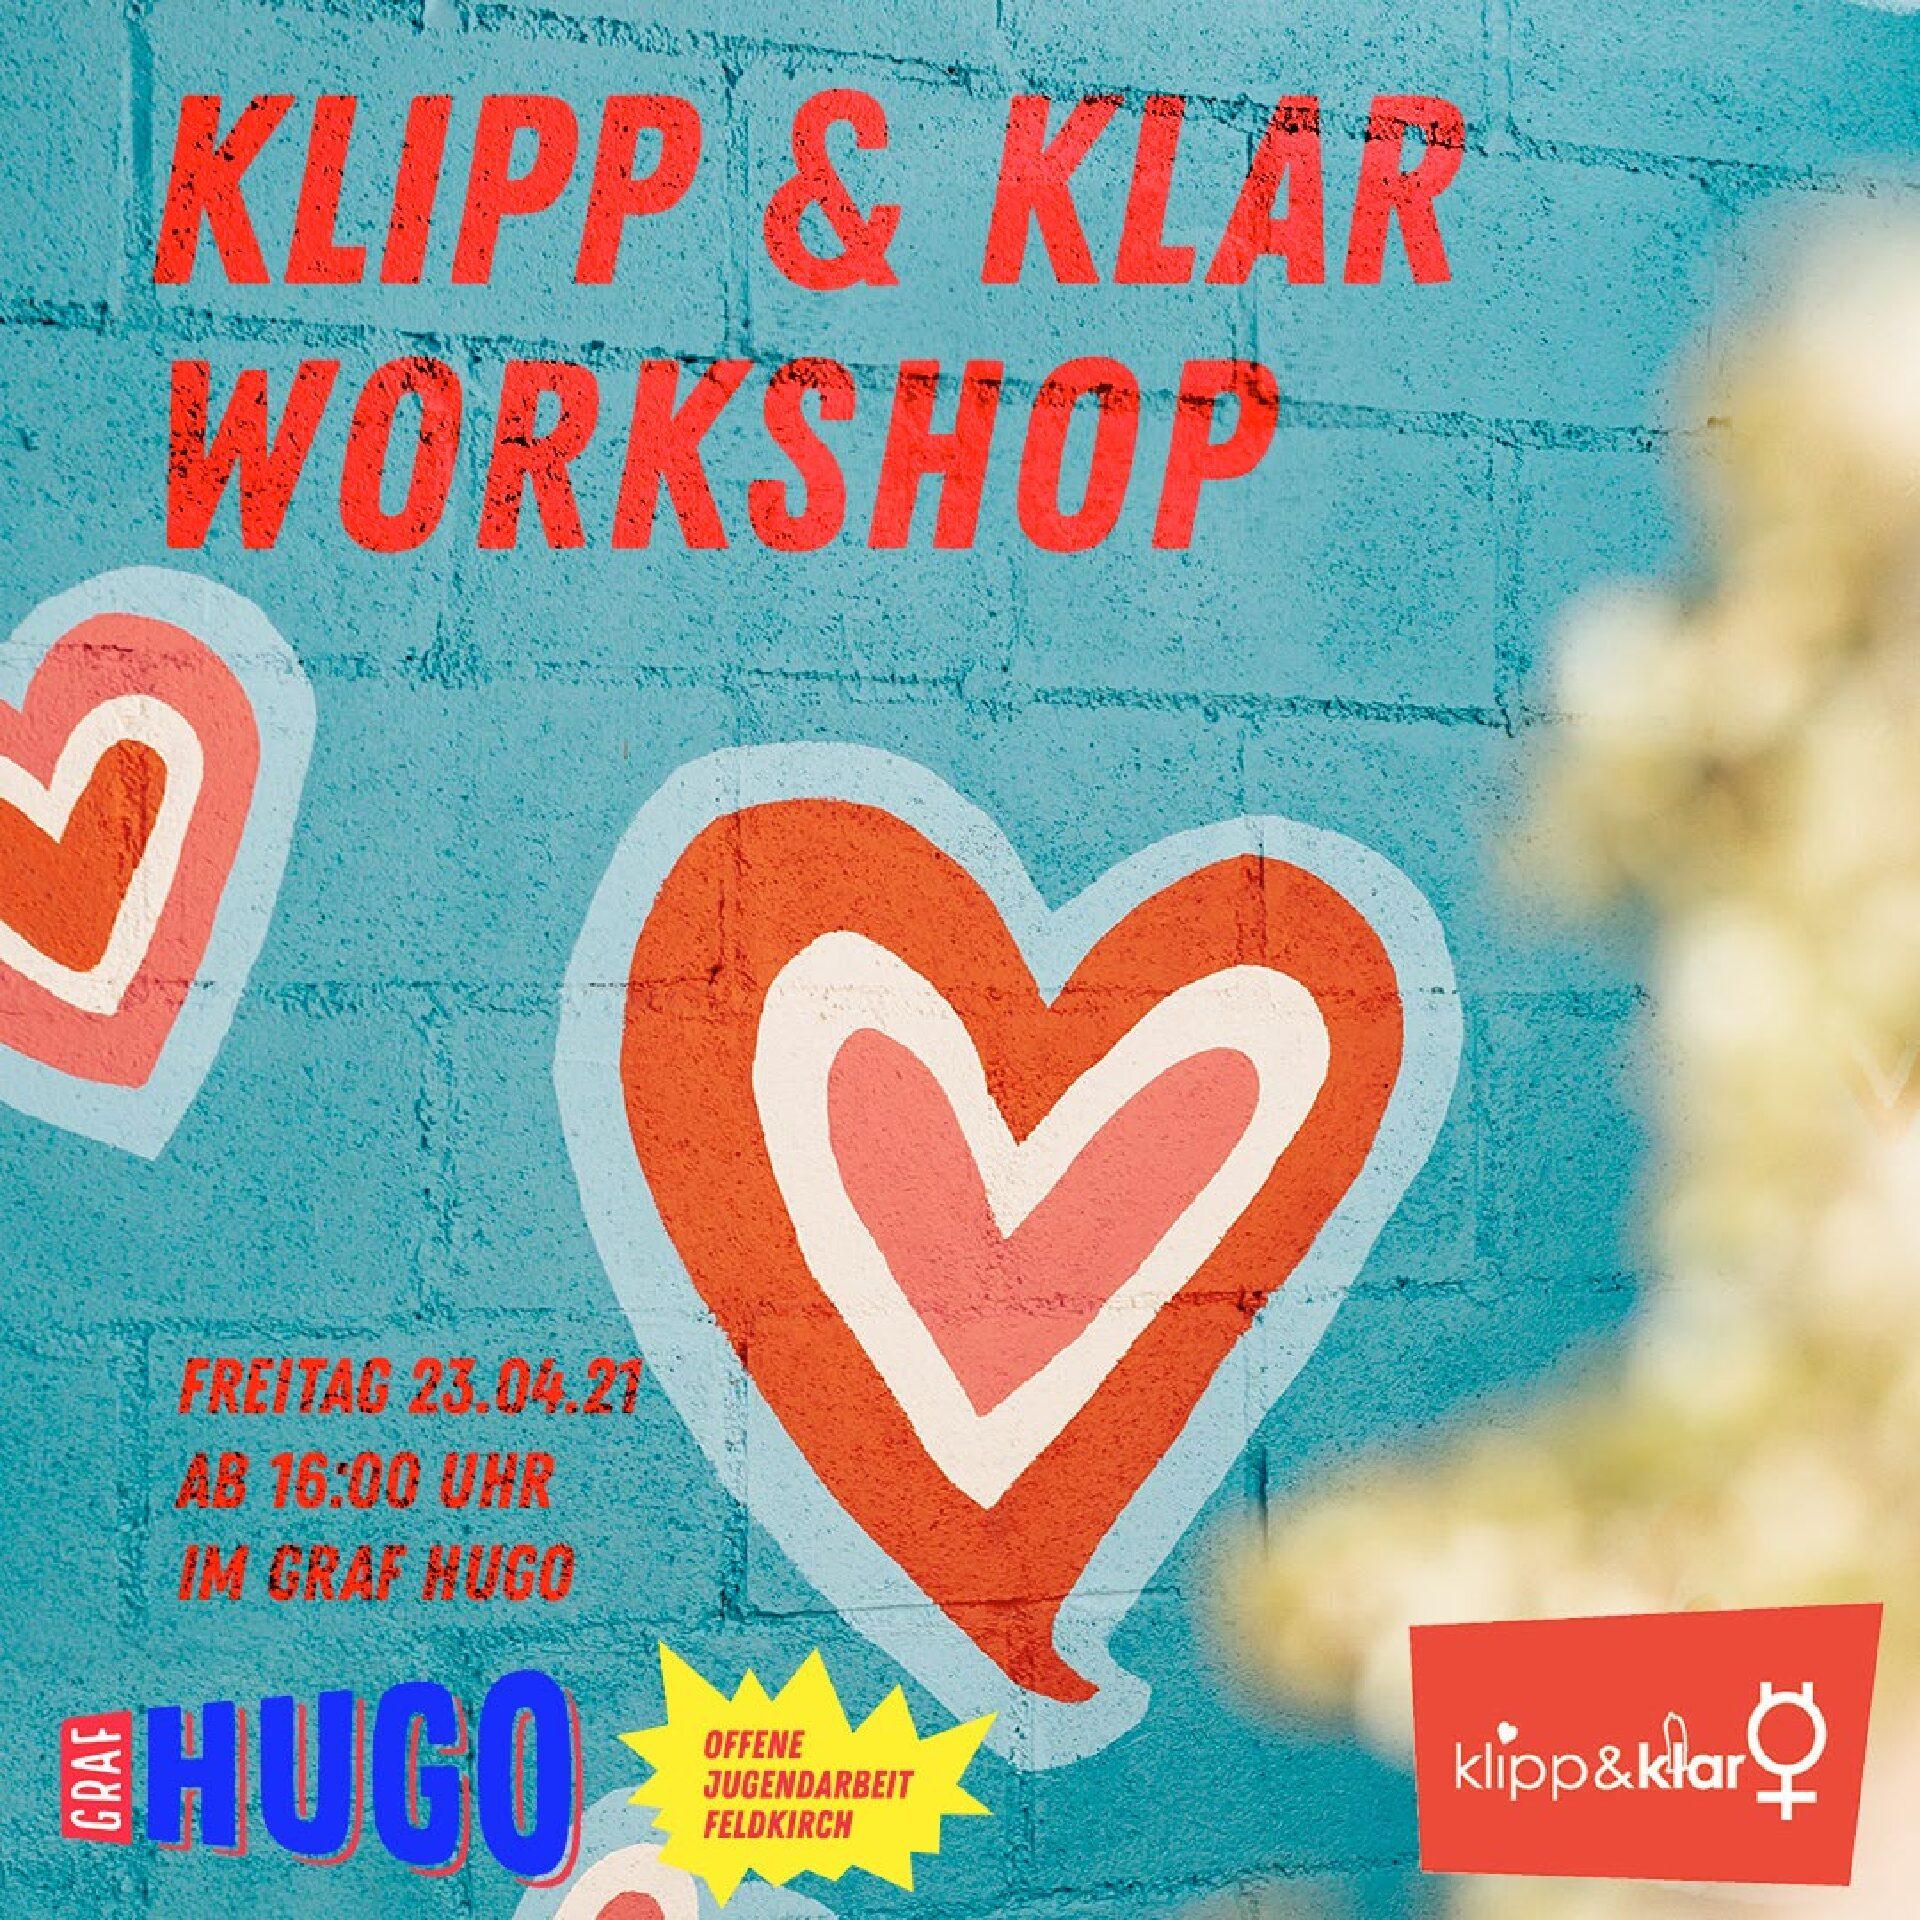 Klipp & Klar Workshop im Graf Hugo